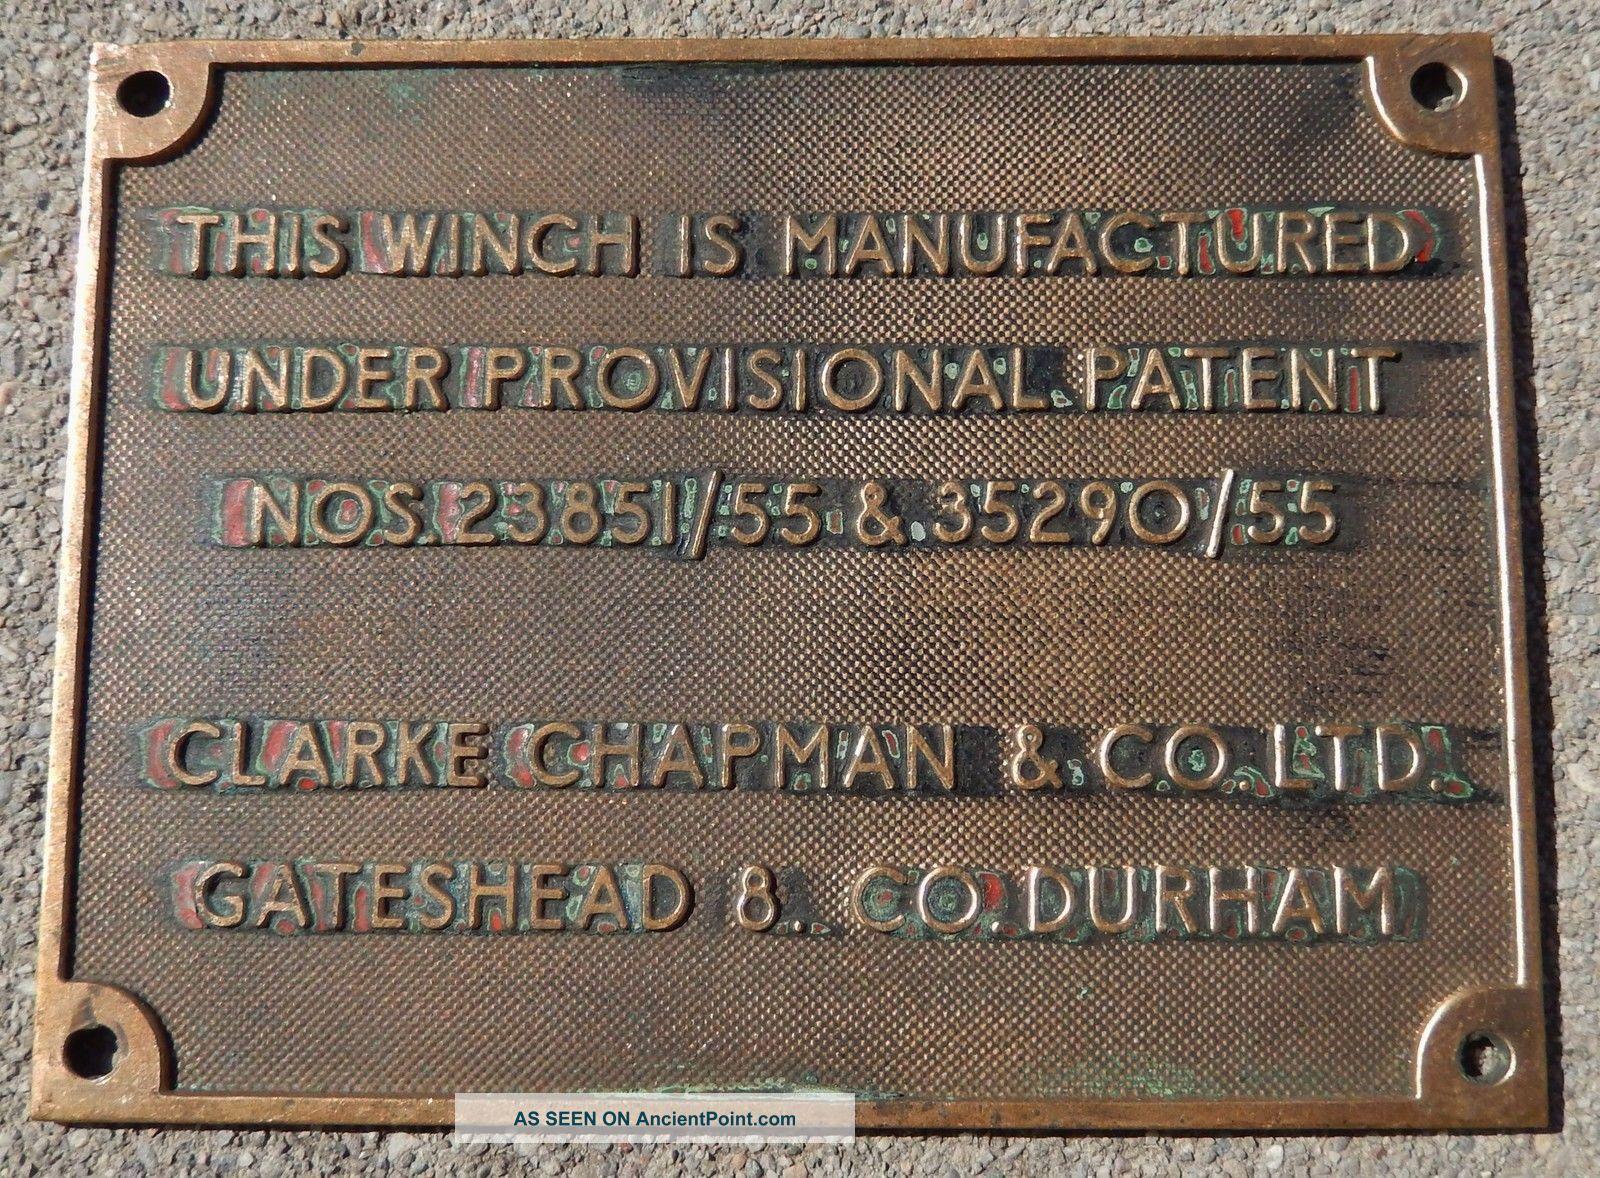 Antique Winch Clarke Chapman & Co.  Bronze/brass Plaque - Gateshead 8 Co.  Durham Plaques & Signs photo